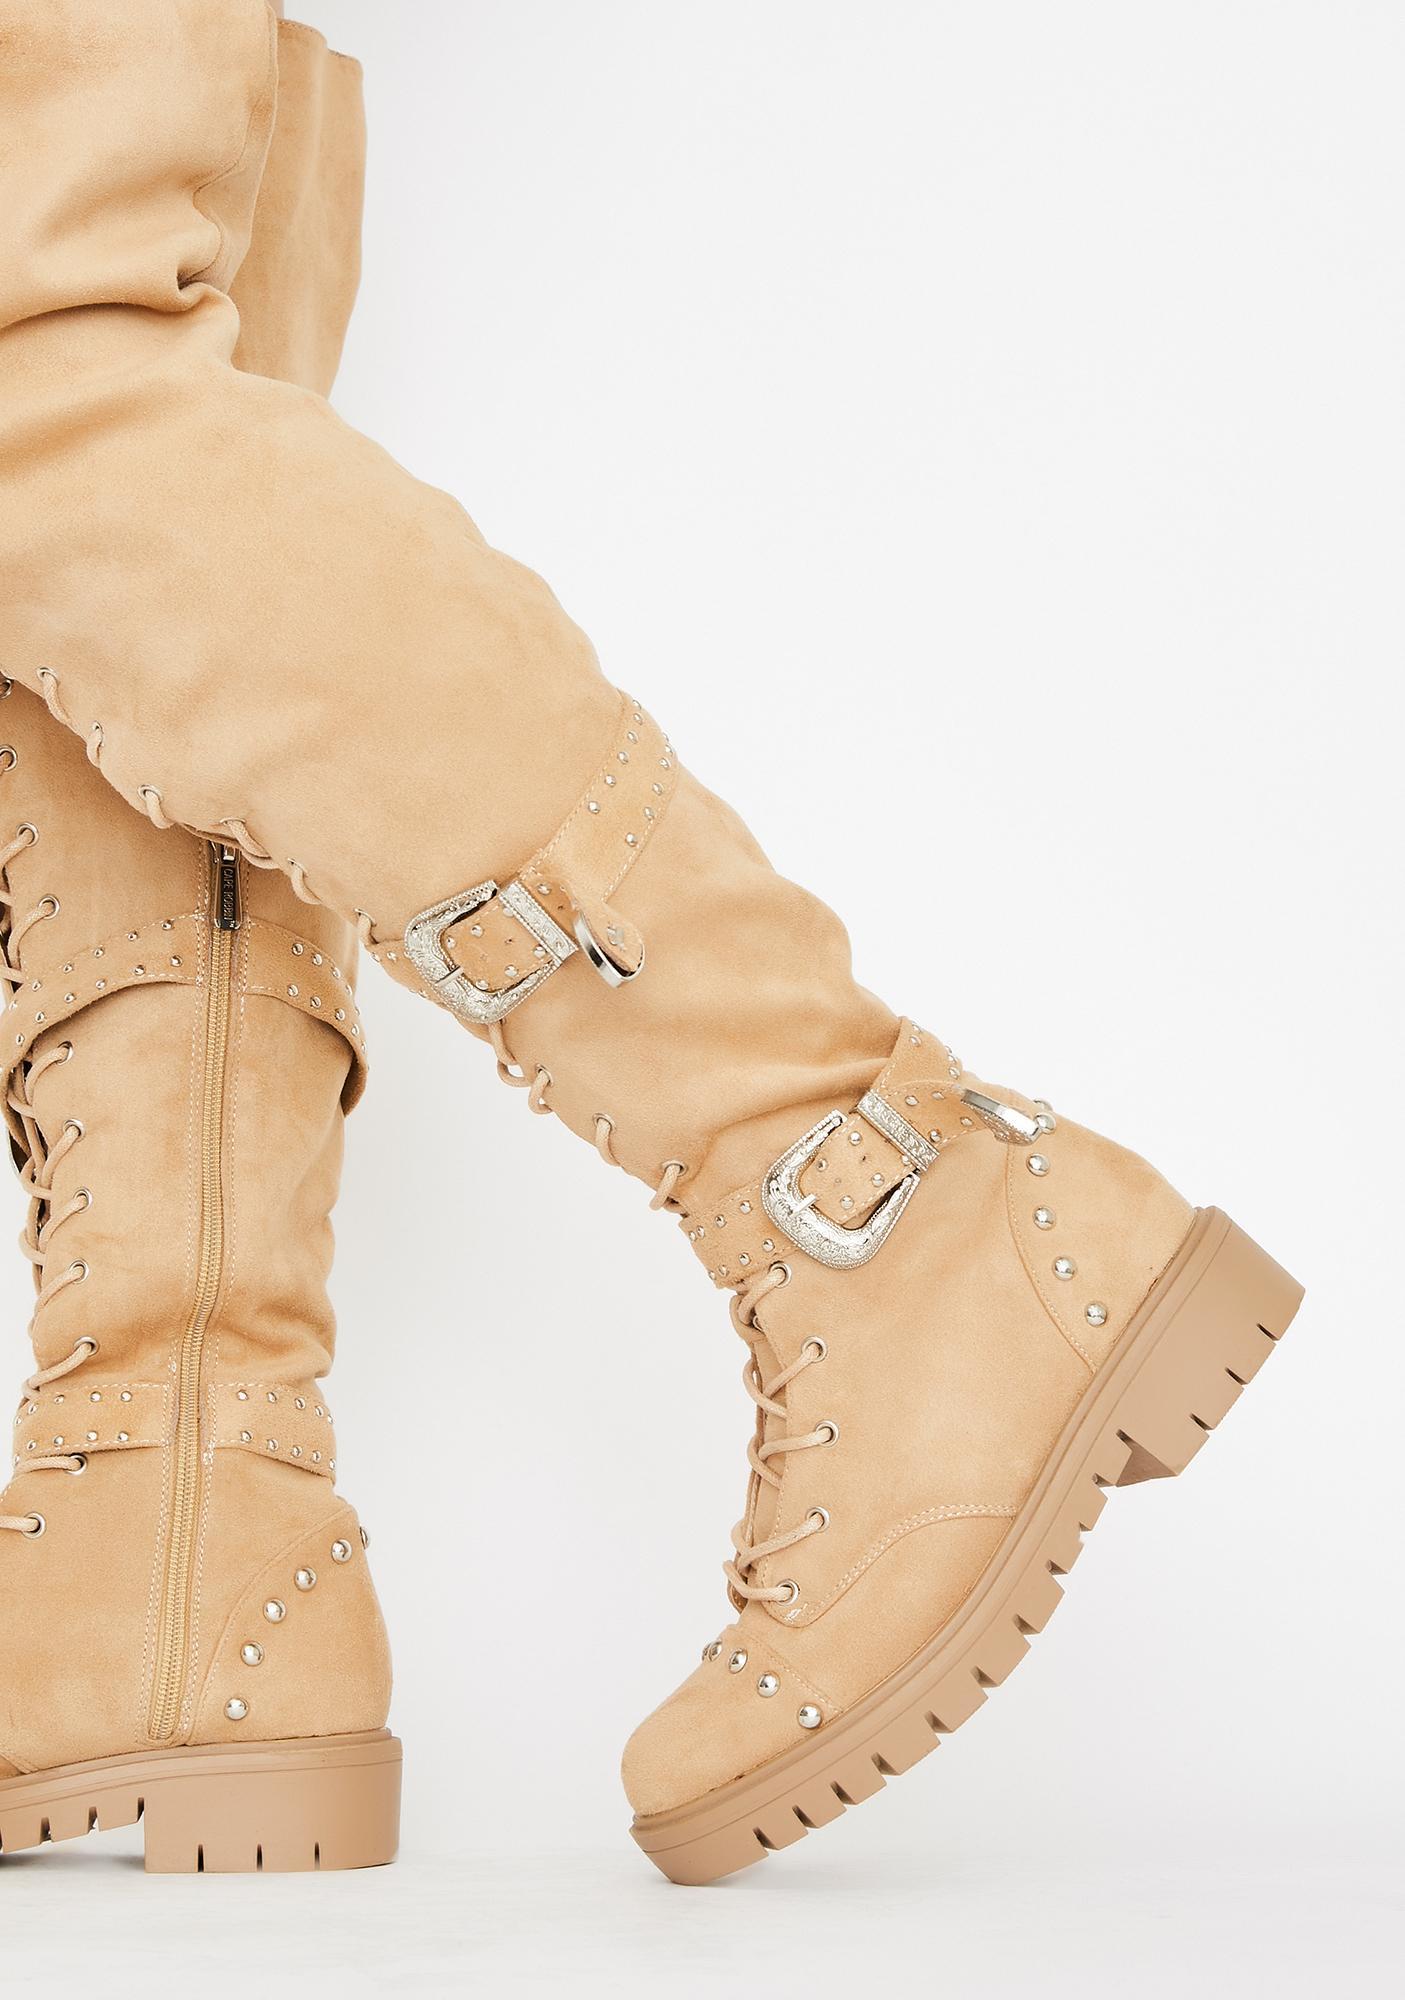 Glamazon Gurl Knee High Boots